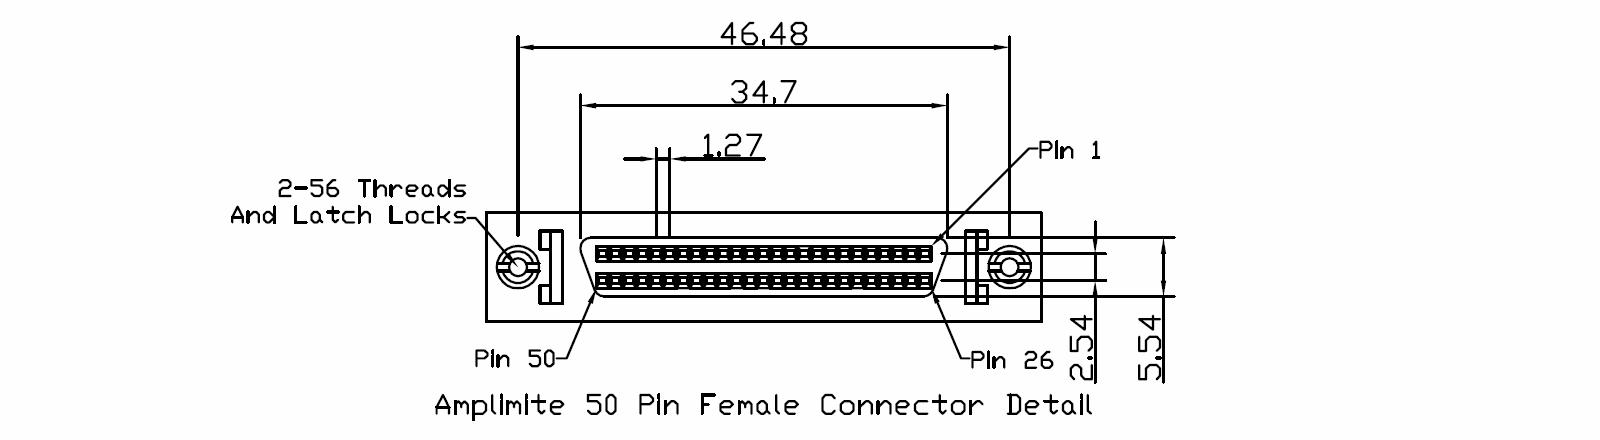 Amplimite 50 Pin Female Connector